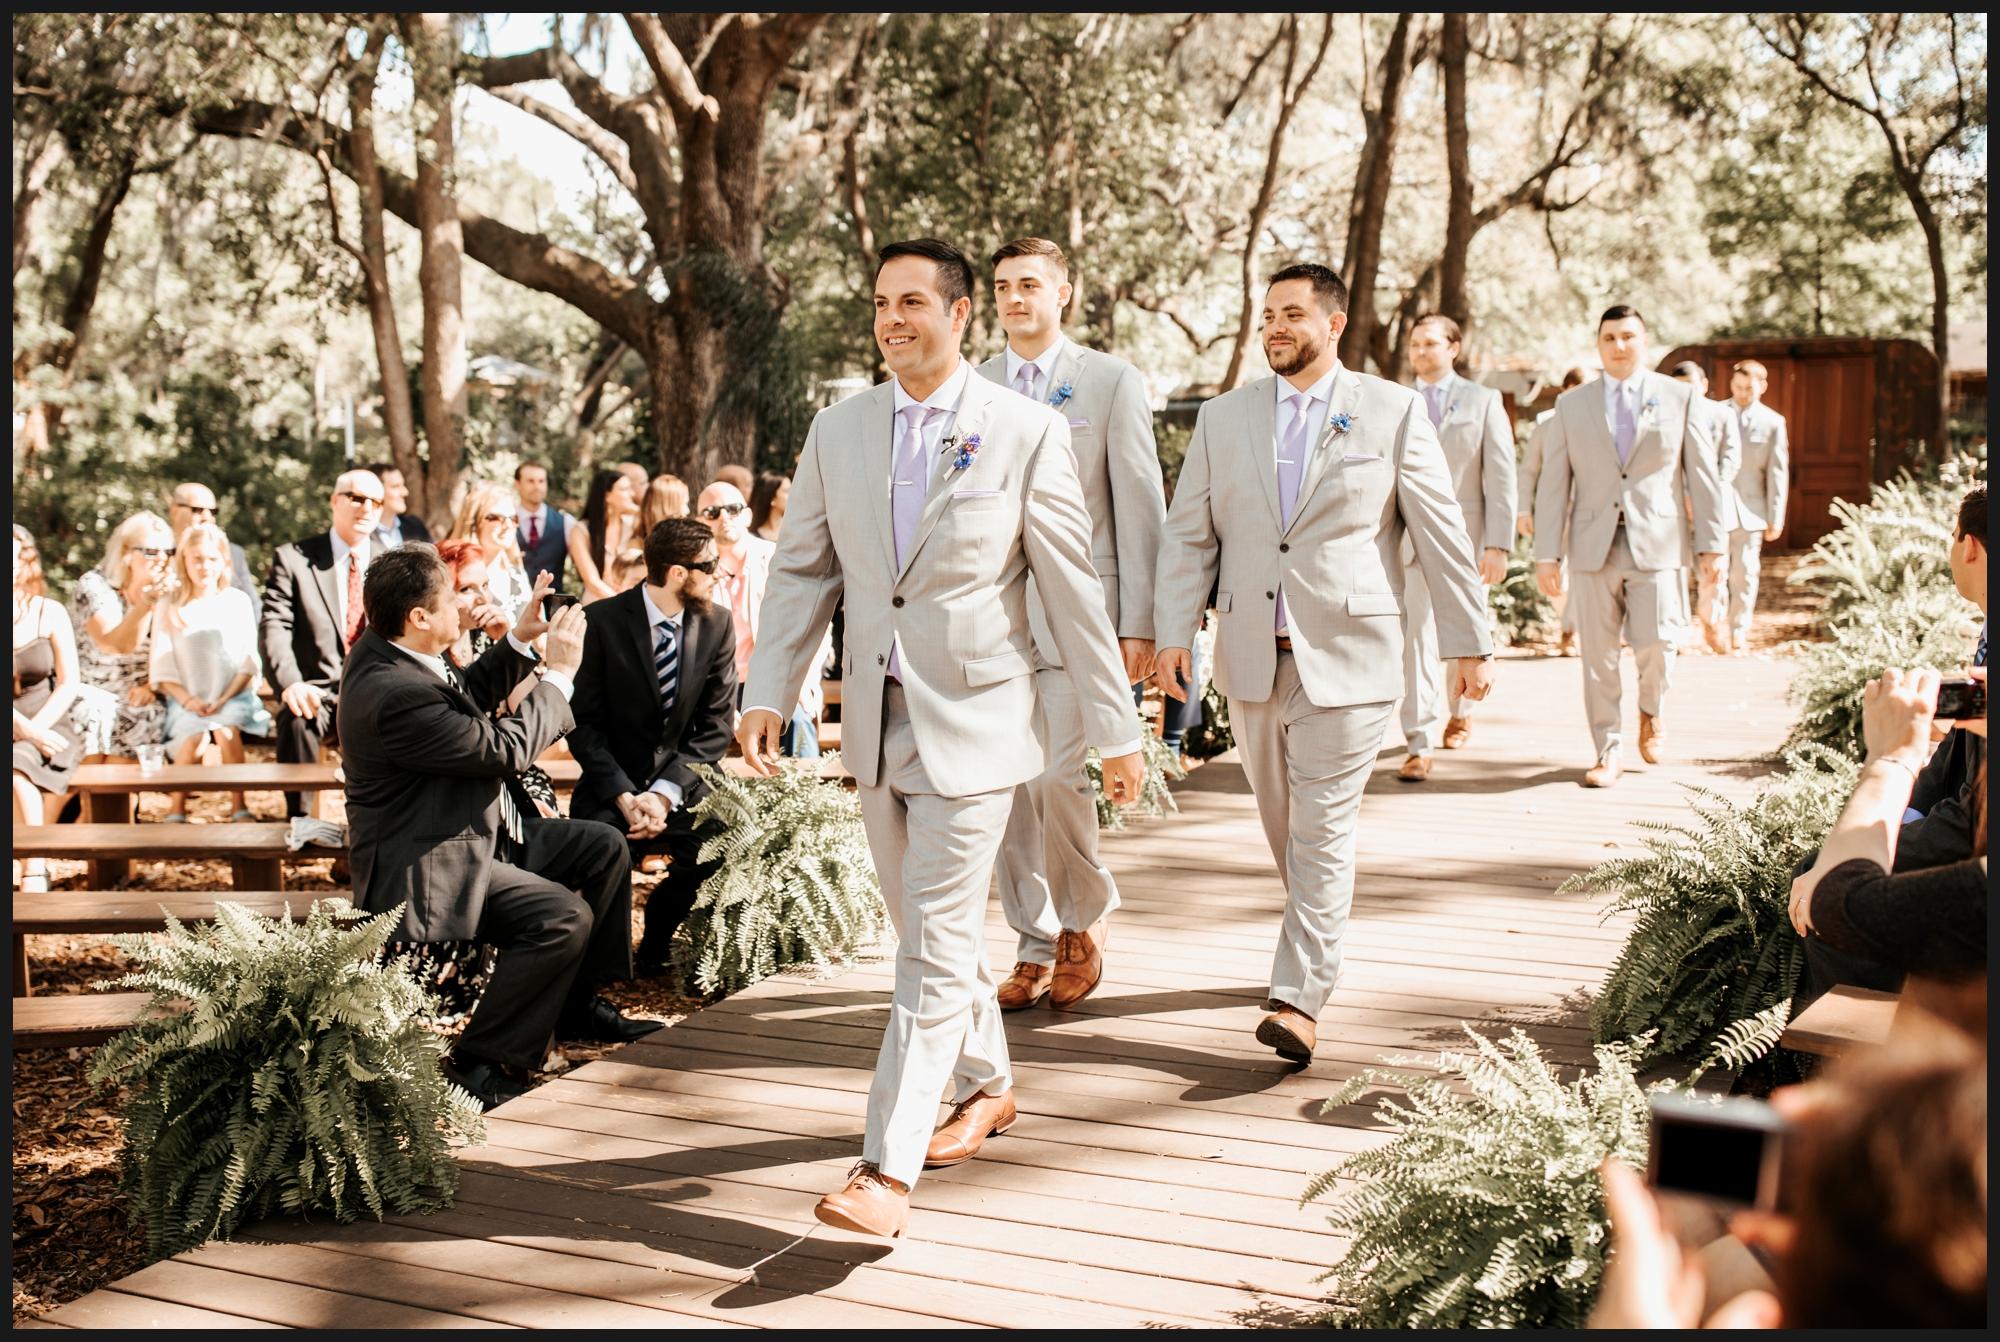 Orlando-Wedding-Photographer-destination-wedding-photographer-florida-wedding-photographer-bohemian-wedding-photographer_1608.jpg